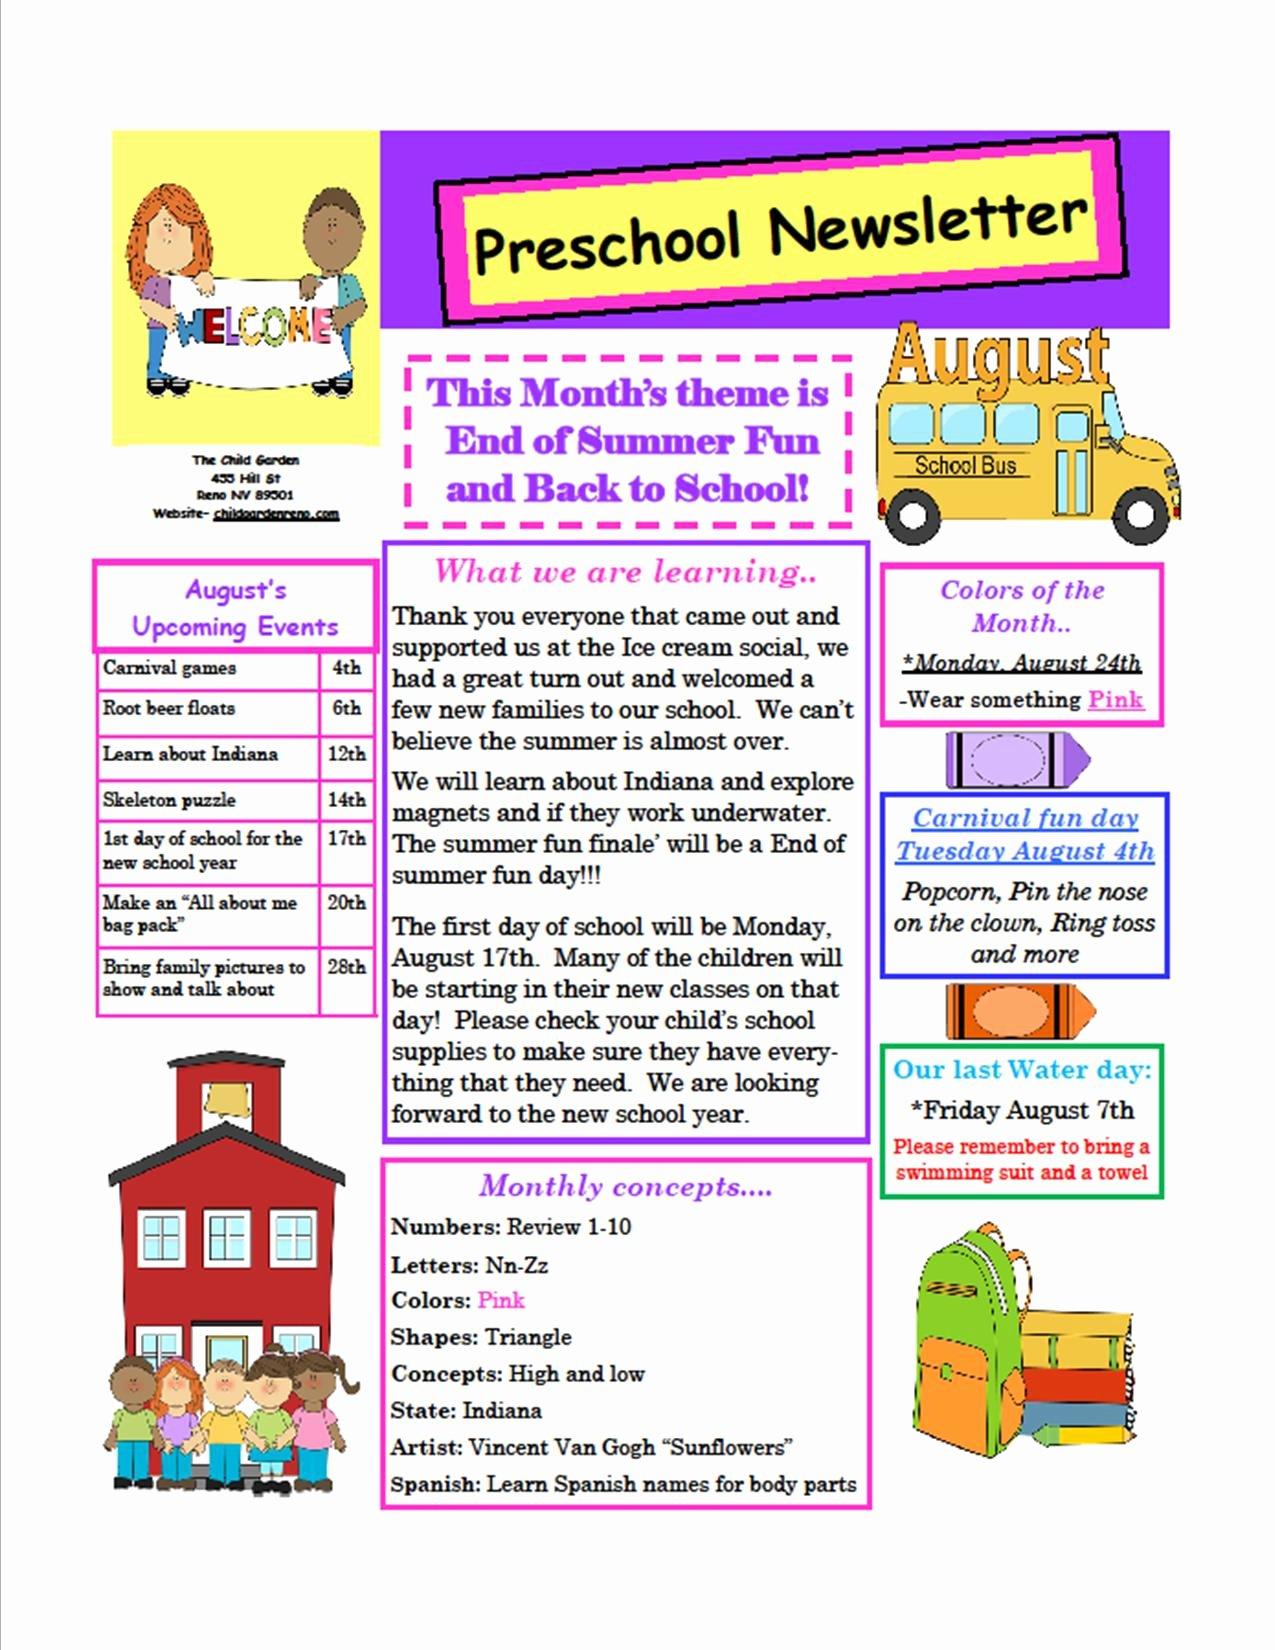 Preschool Newsletter Template Free Unique the Child Garden Preschool